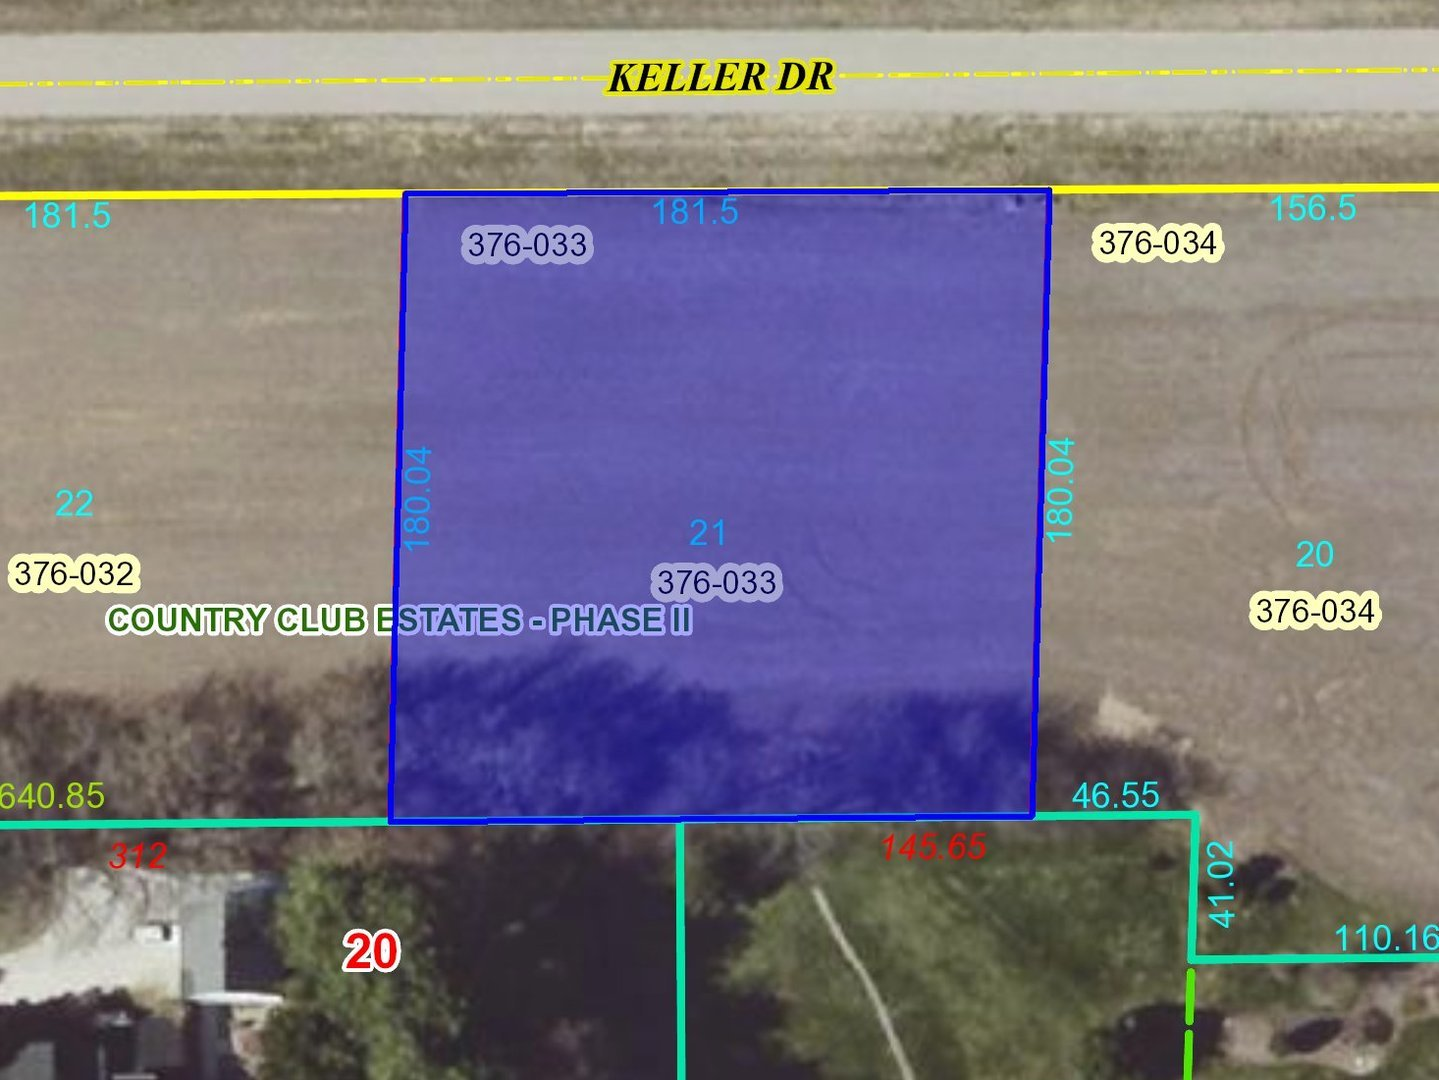 735 Keller Drive DIXON, IL 61021